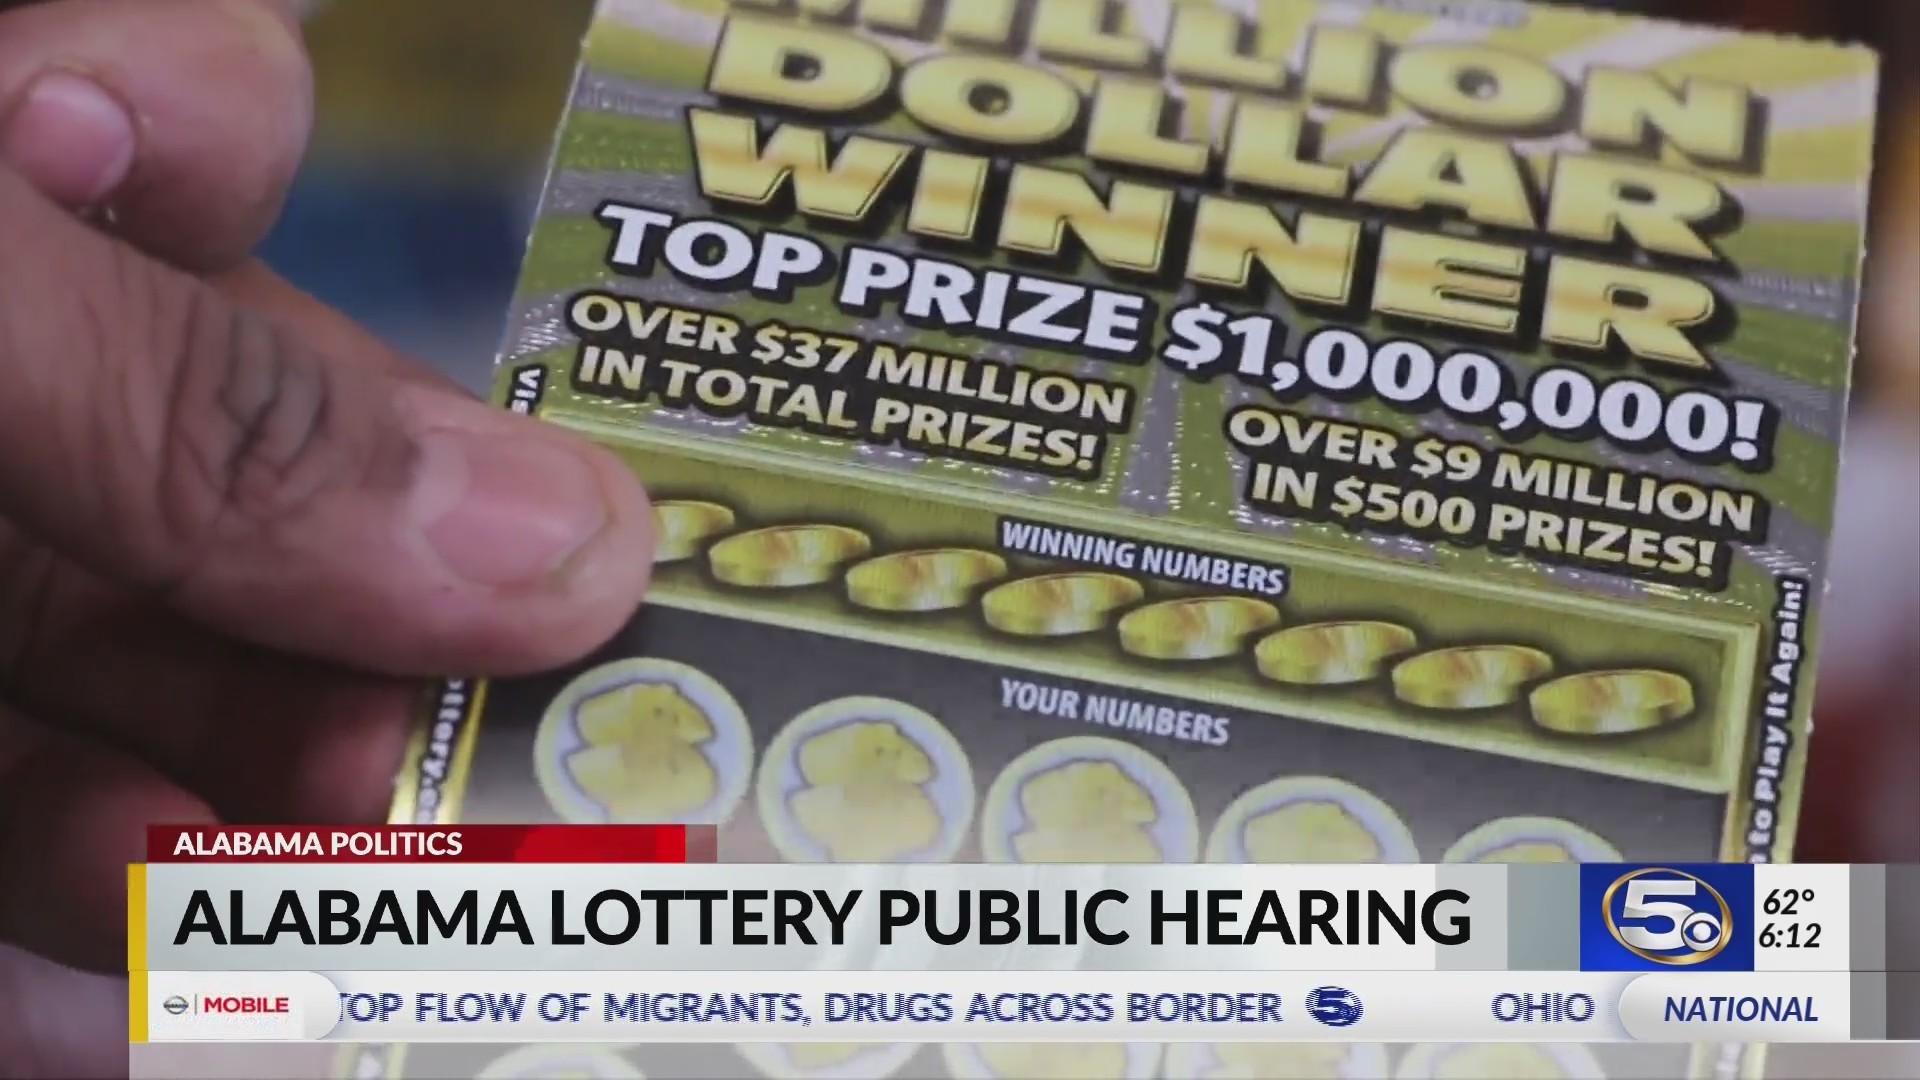 VIDEO__Alabama_lottery_debate_continues_0_20190405011140